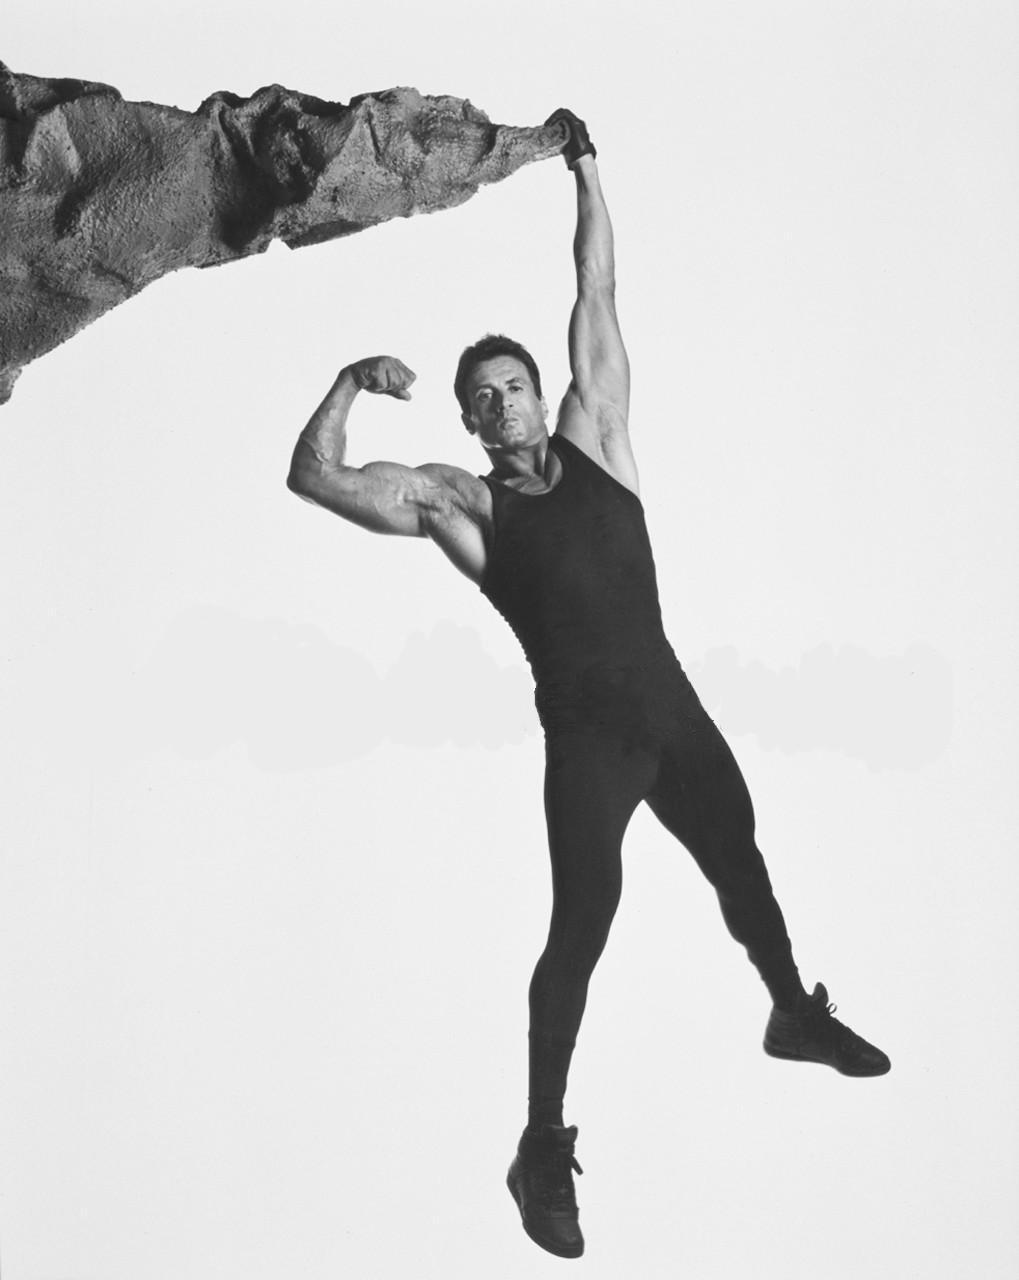 Cliffhanger Stallone